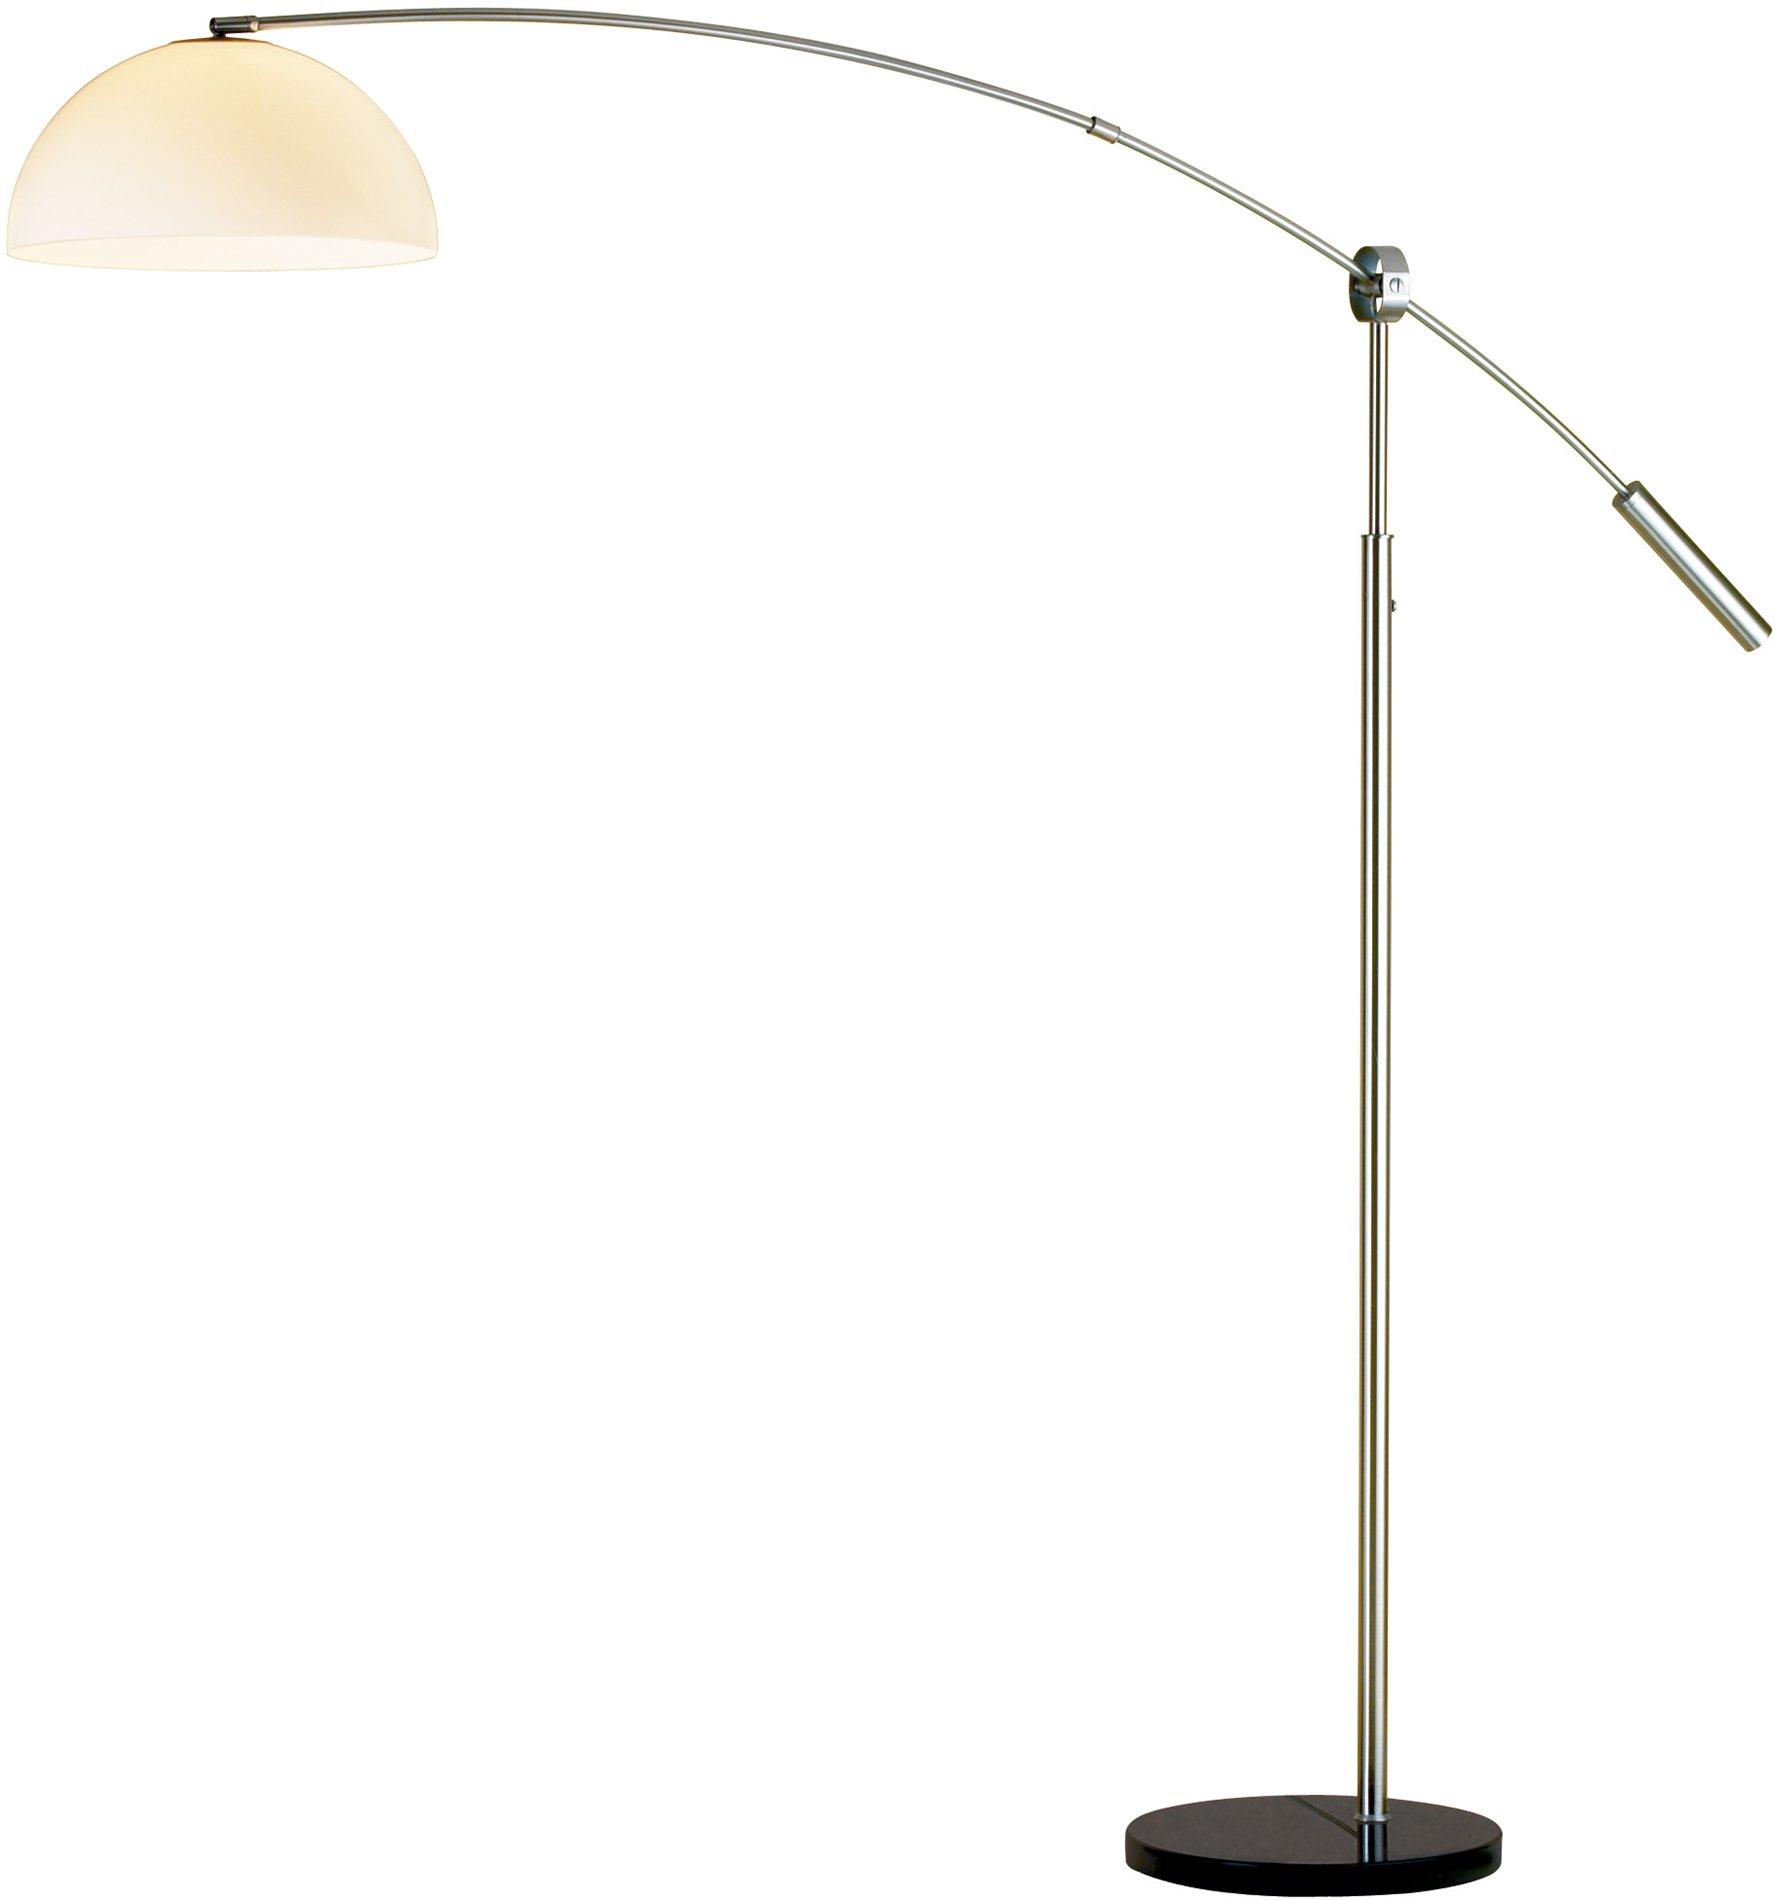 contemporary arc floor lamp x 22 4314 floor lamps contemporary modern. Black Bedroom Furniture Sets. Home Design Ideas